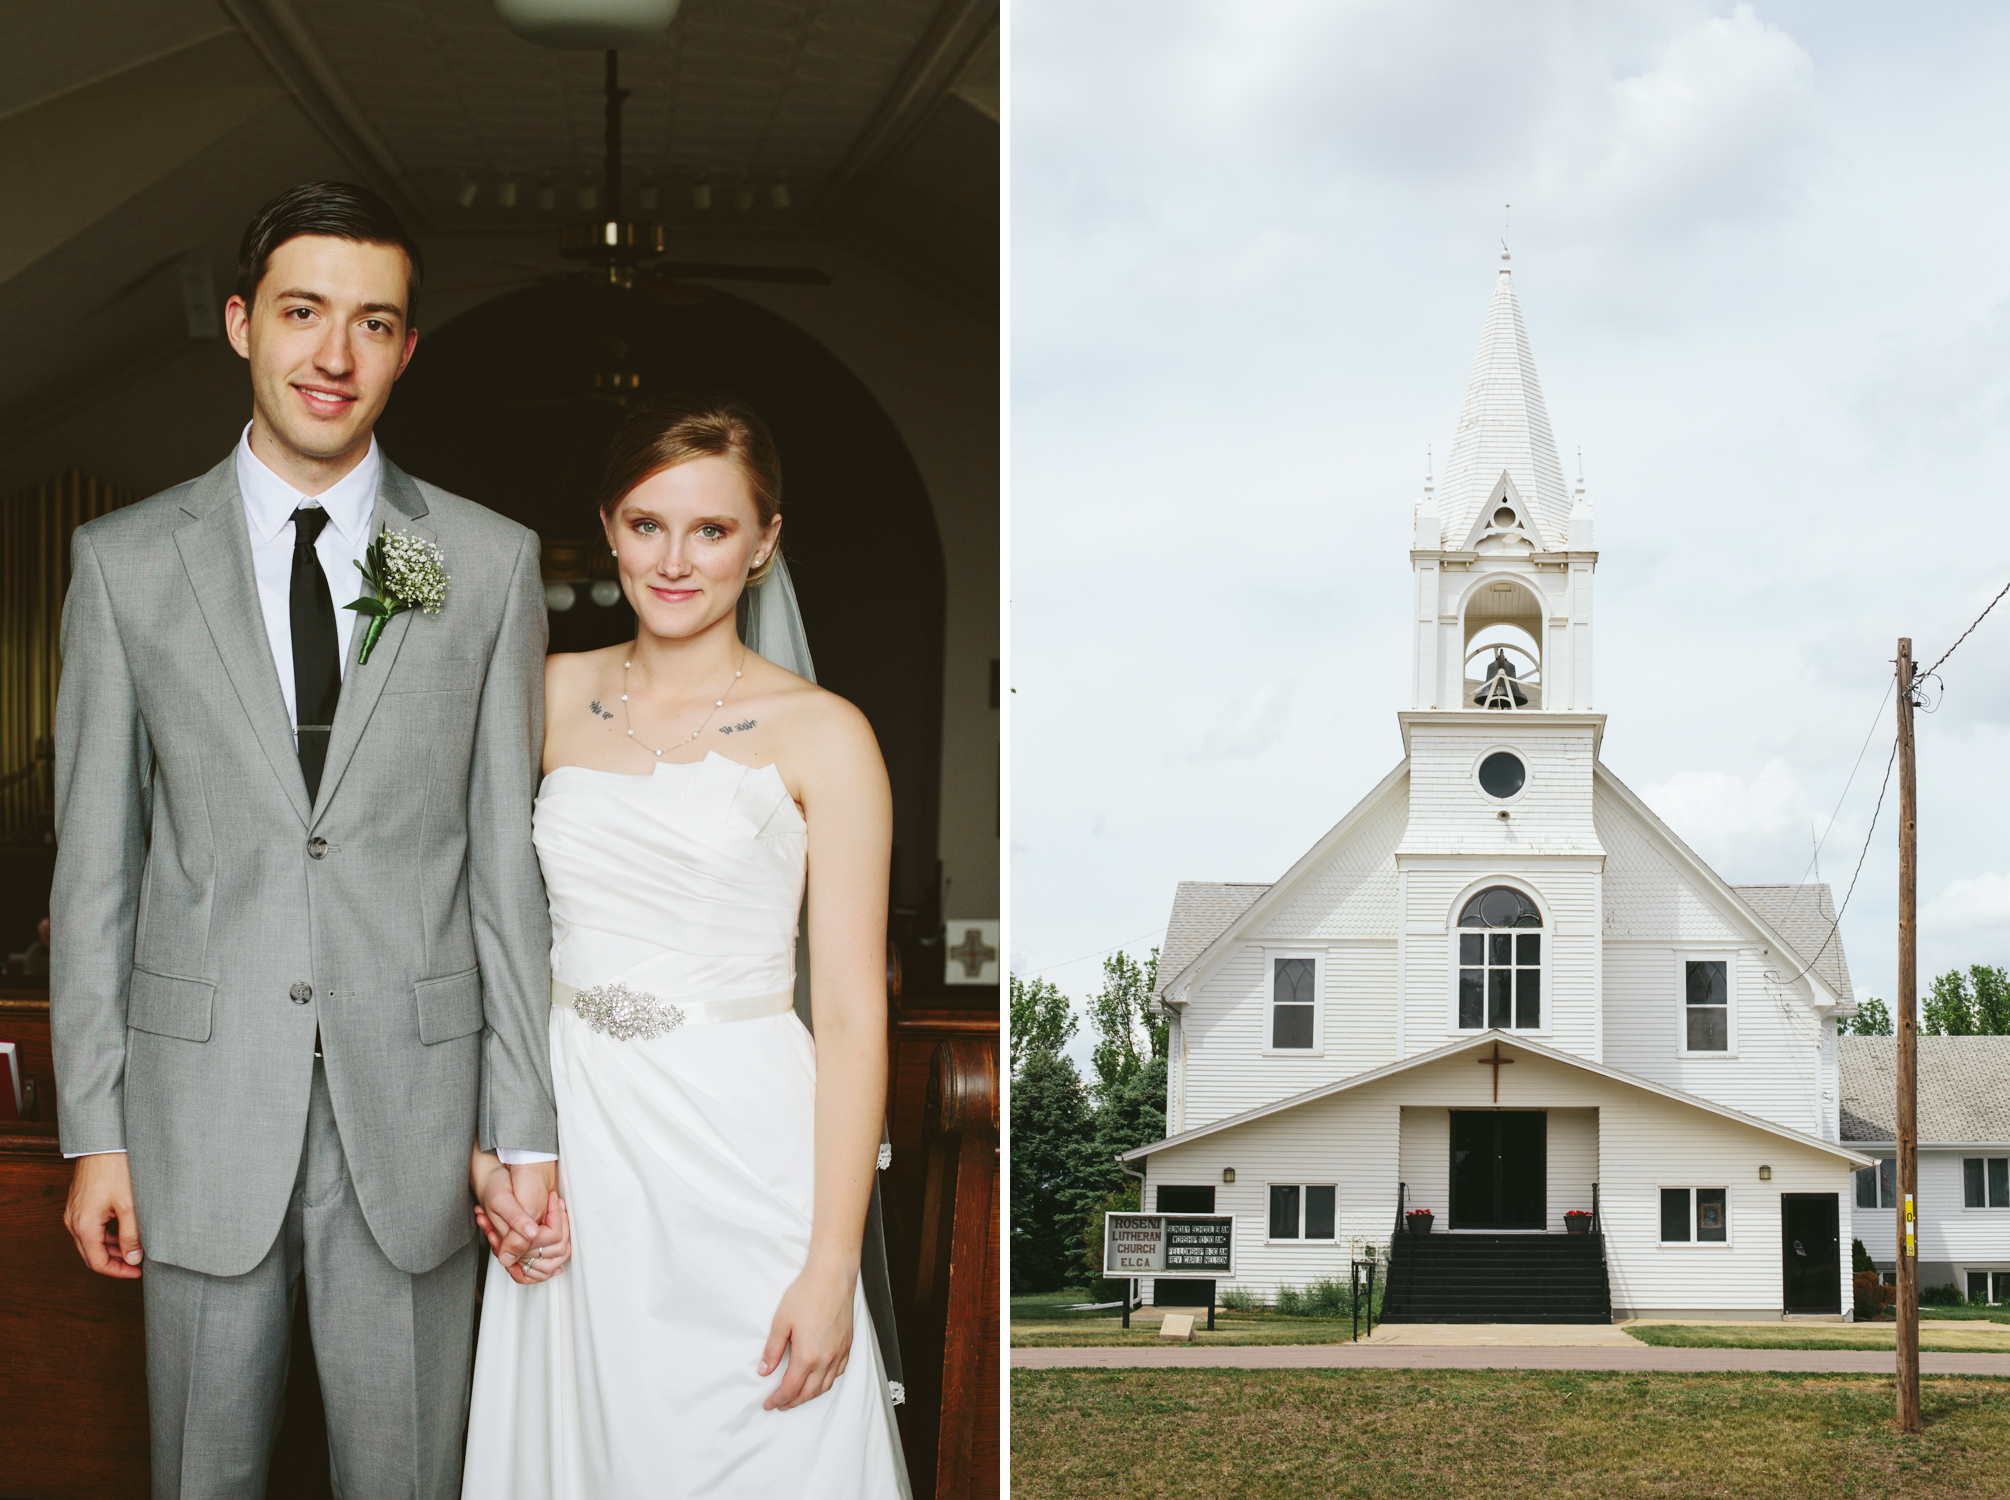 South-Dakota-Intimate-Wedding-31.jpg